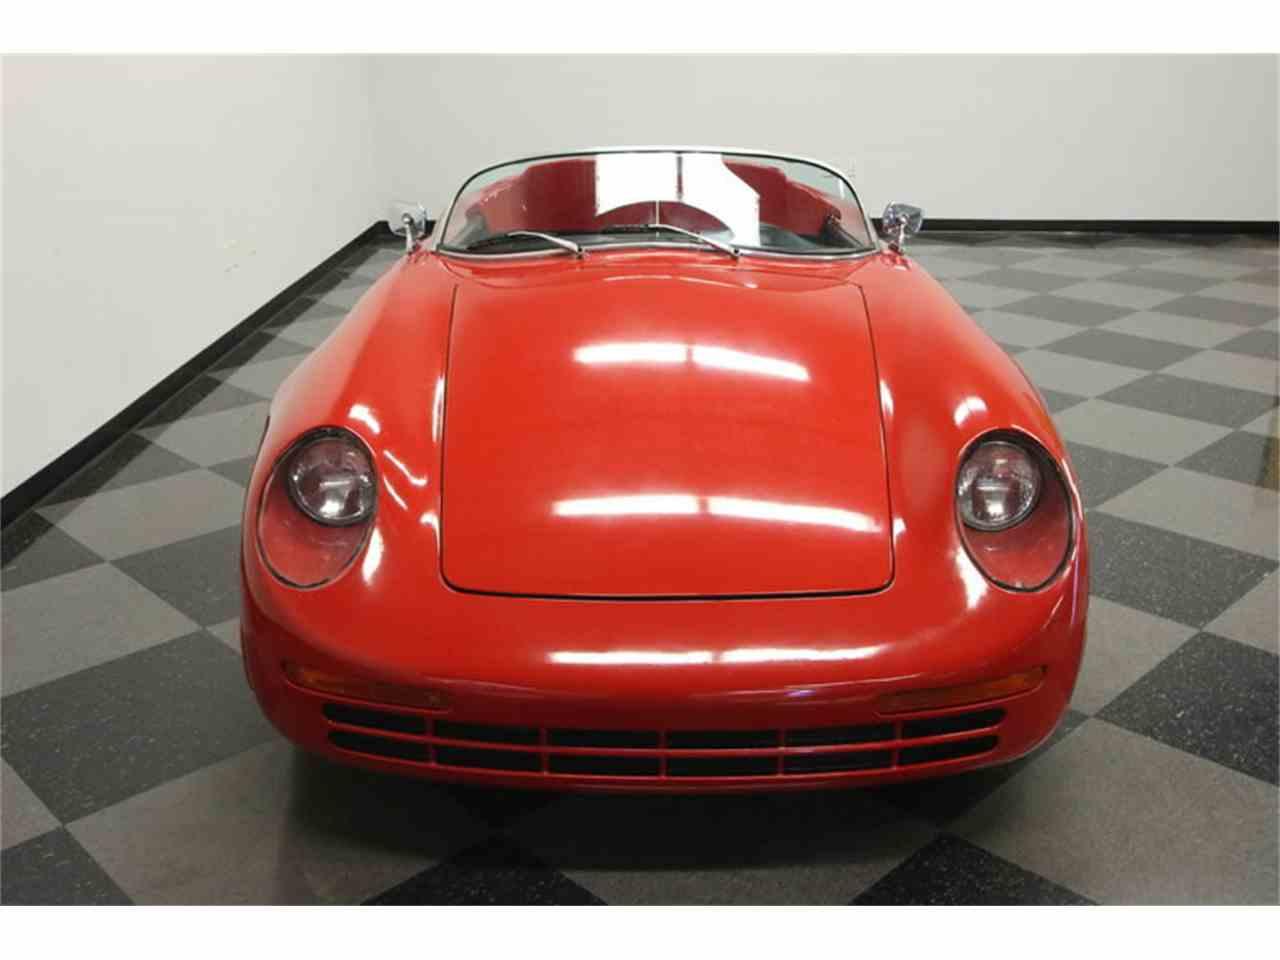 Large Picture of 1994 Porsche 359 Replica - $18,900.00 Offered by Bob's Classics, Inc. - LTAU